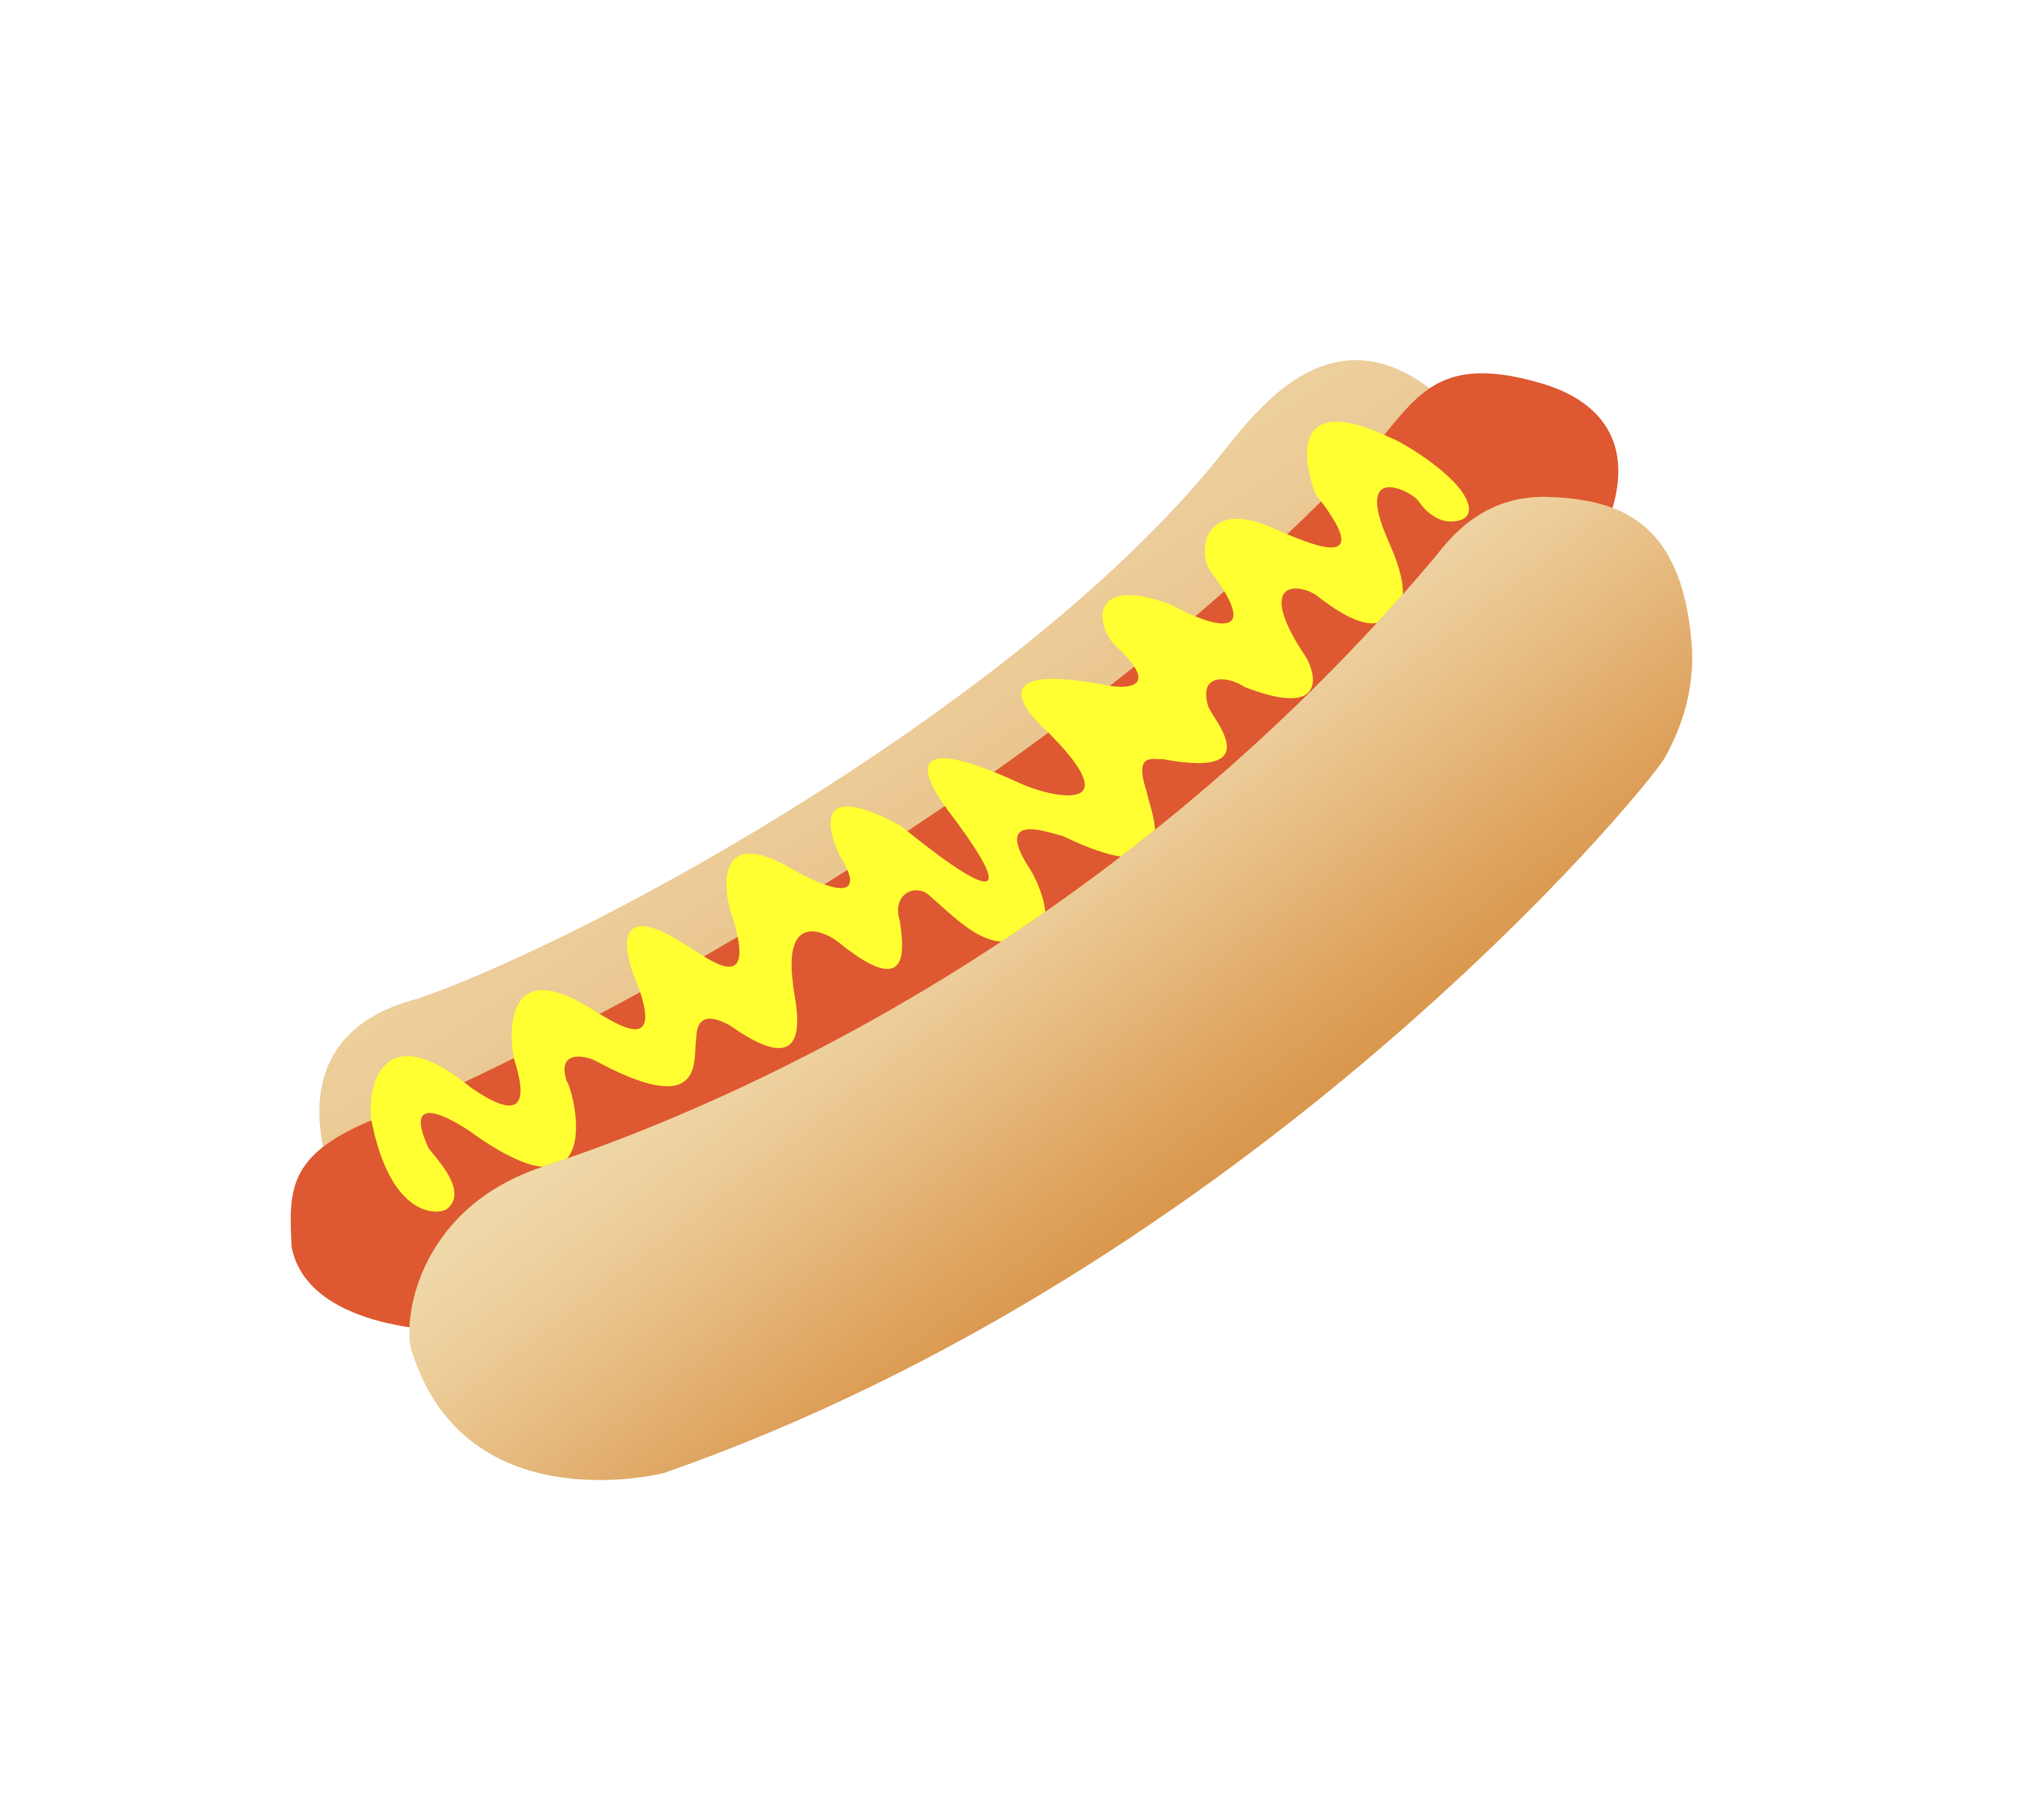 Hot png transparent images. Hotdog clipart chili dog